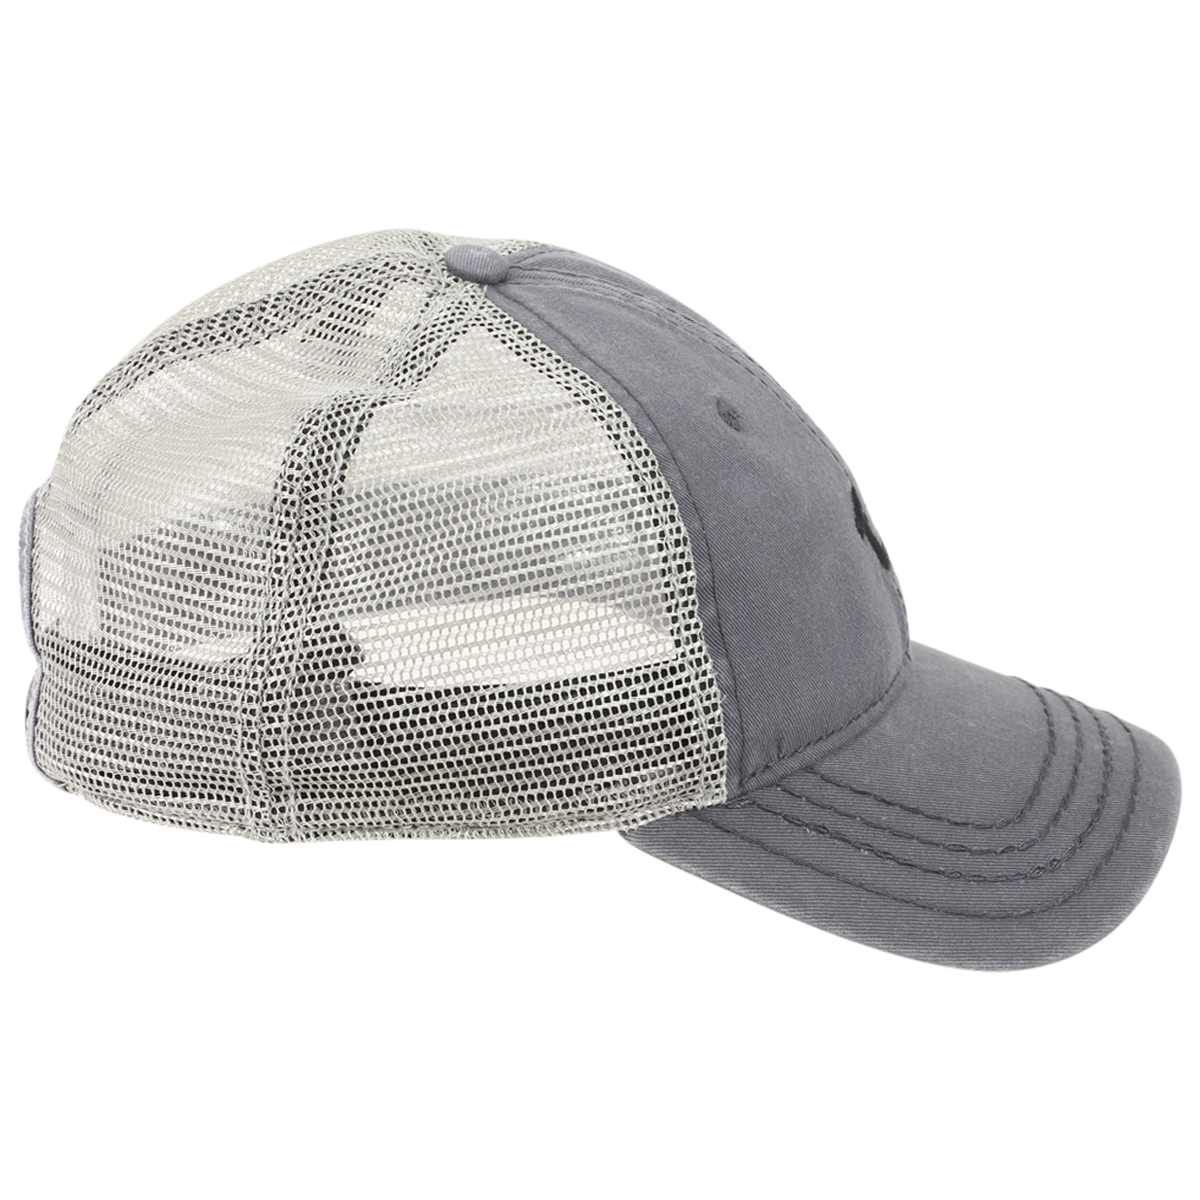 531e00282 Details about True Religion Core Logo Strapback Trucker Cap Hat (One Size  Fits Most)